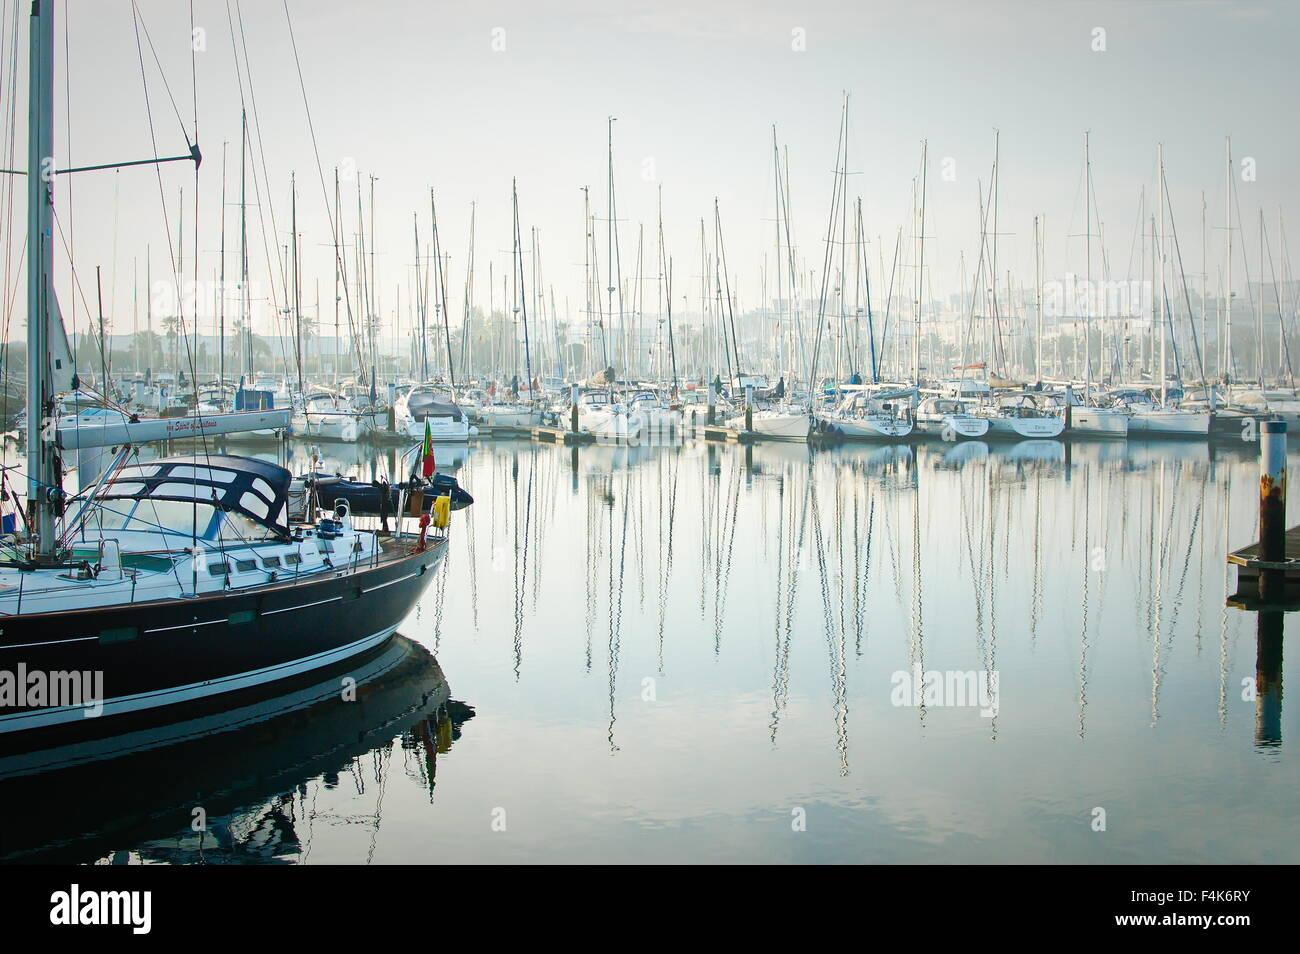 Marina de Lagos, Lagos, Algarve, Portugal, 2015-10-16. Boats moored during a dense fog in the marina. - Stock Image